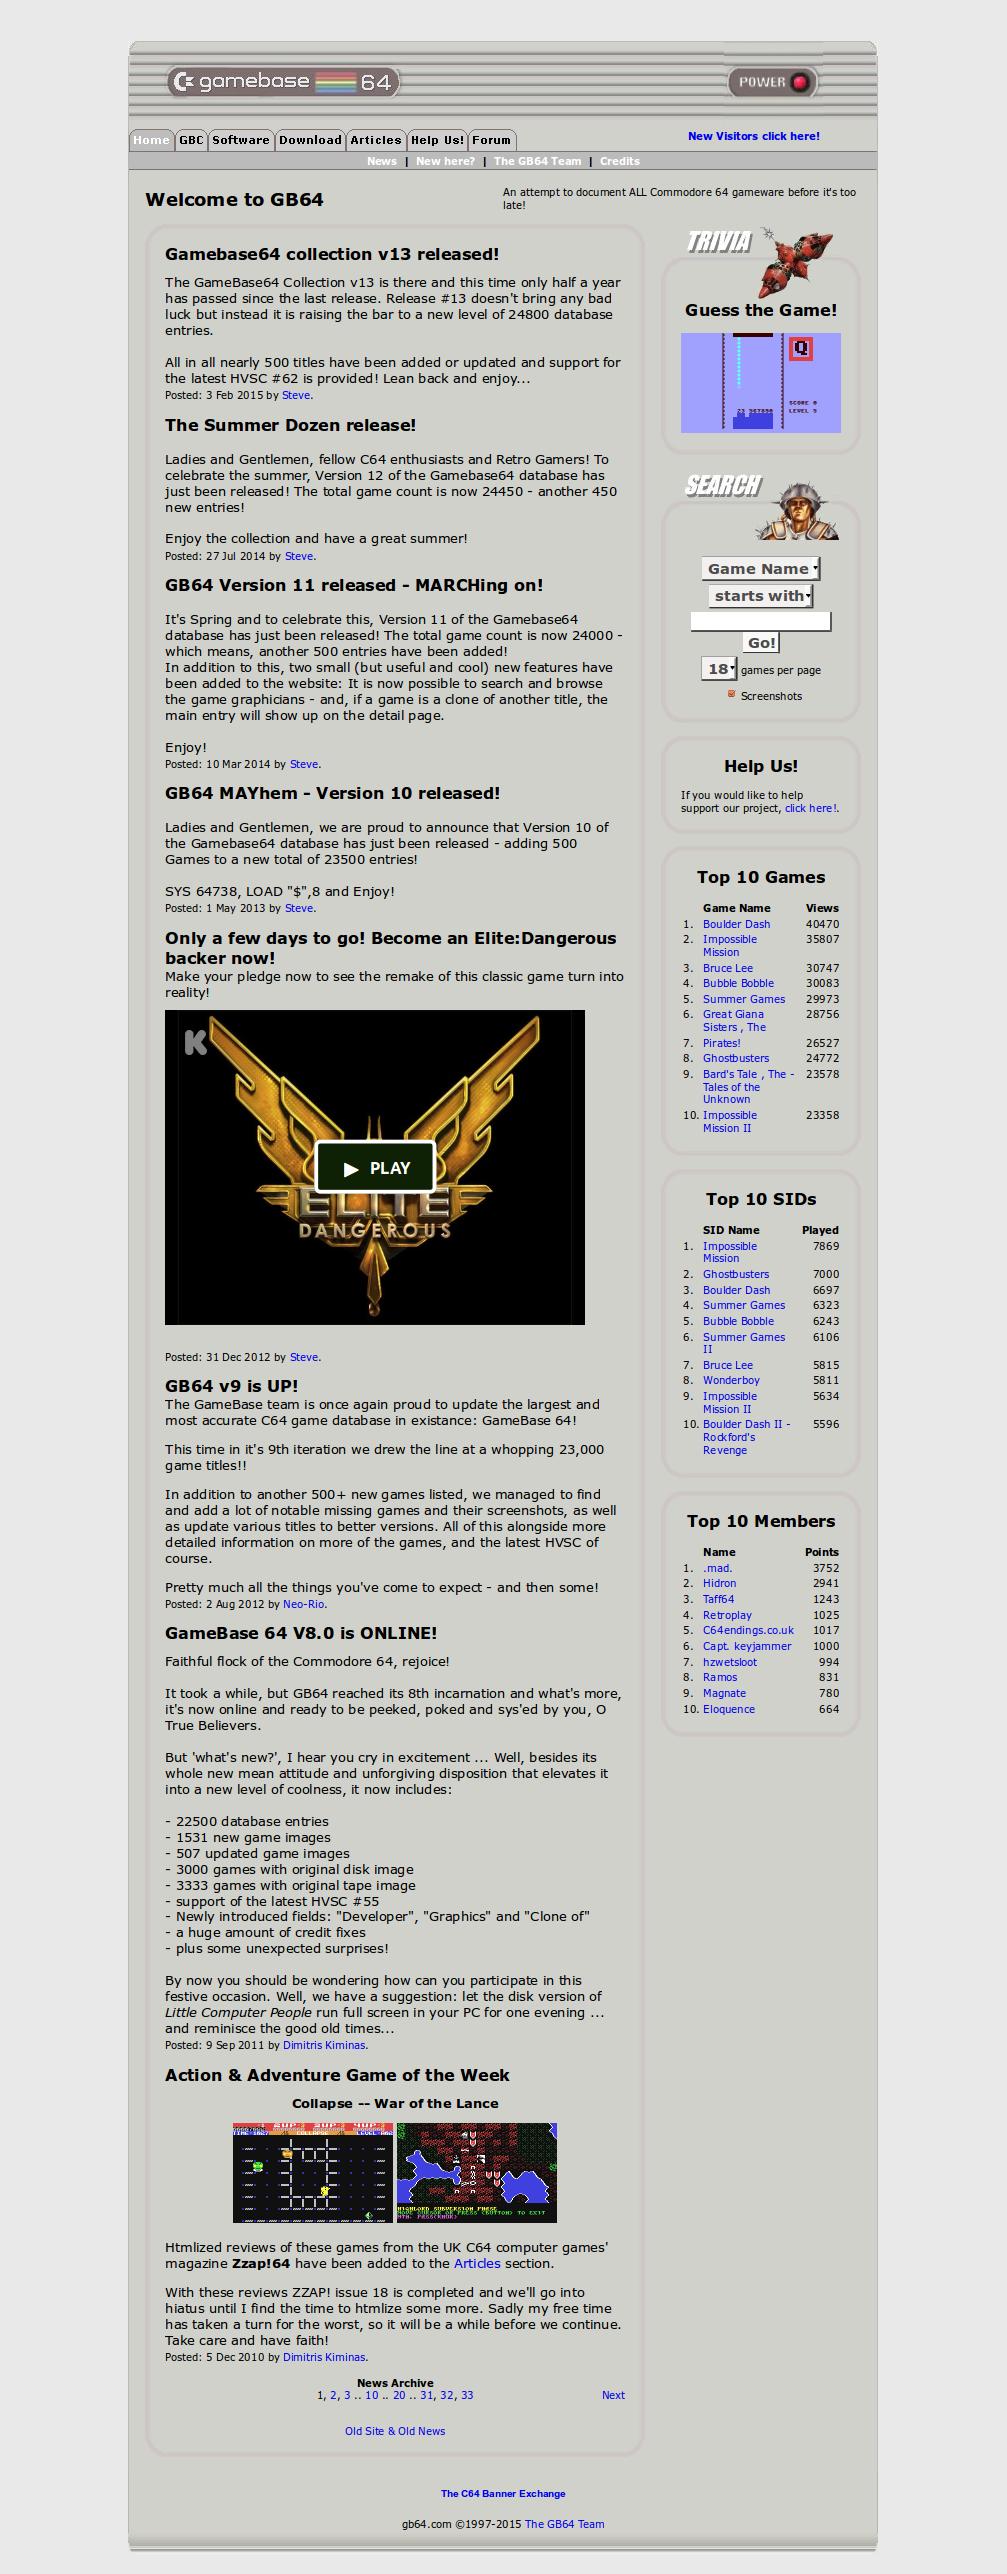 Screenshot of website Gamebase 64